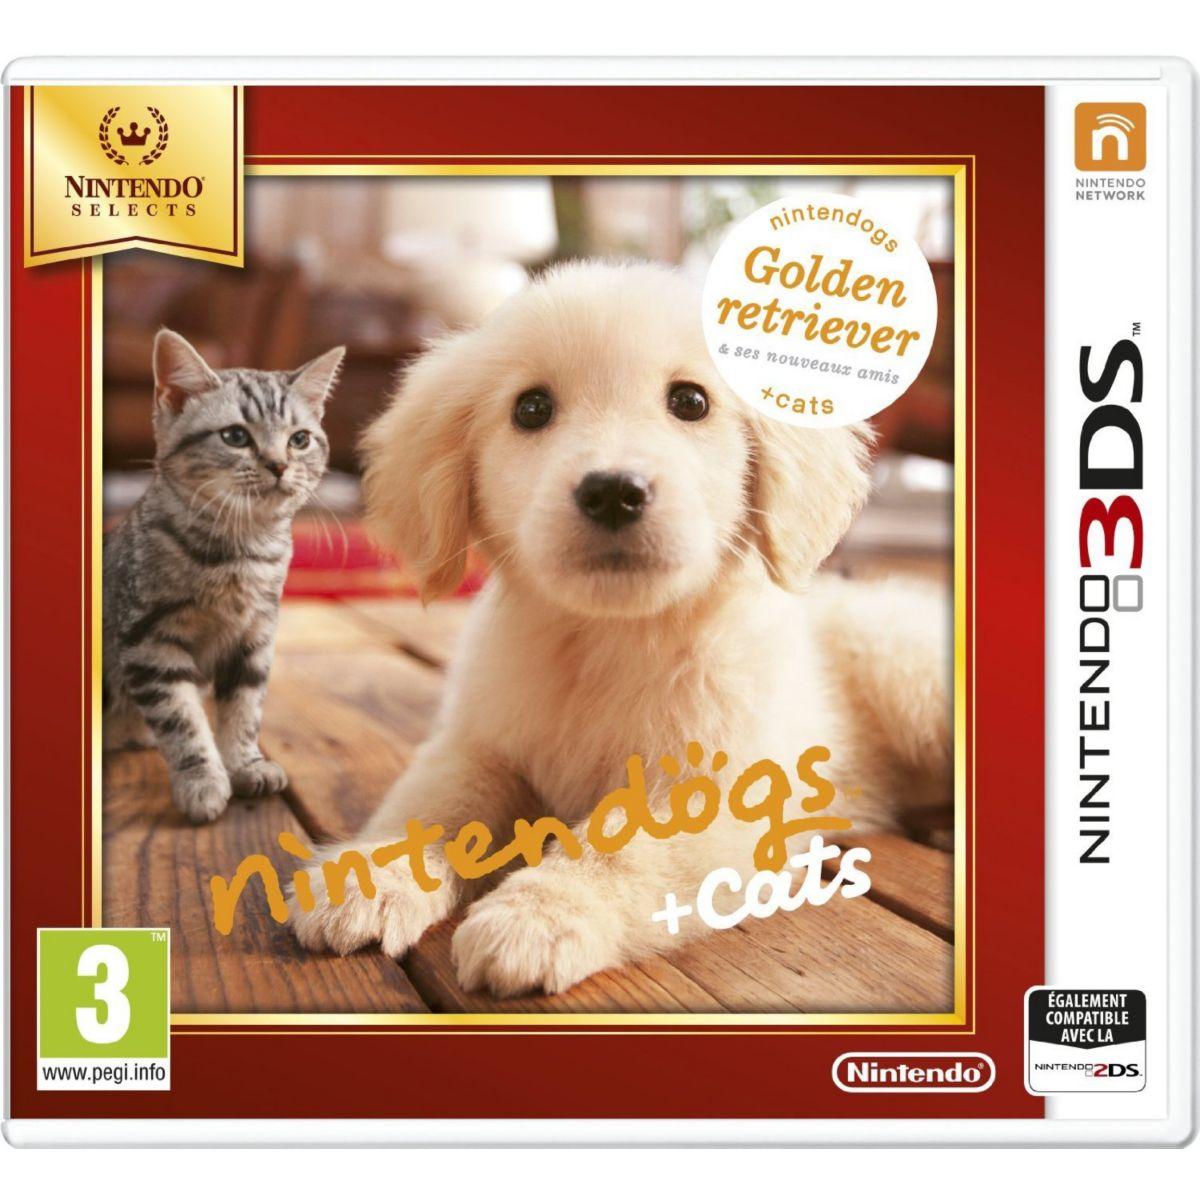 Jeu 3DS NINTENDO Nintendogs + Cats Golden Retriever & Co. (photo)